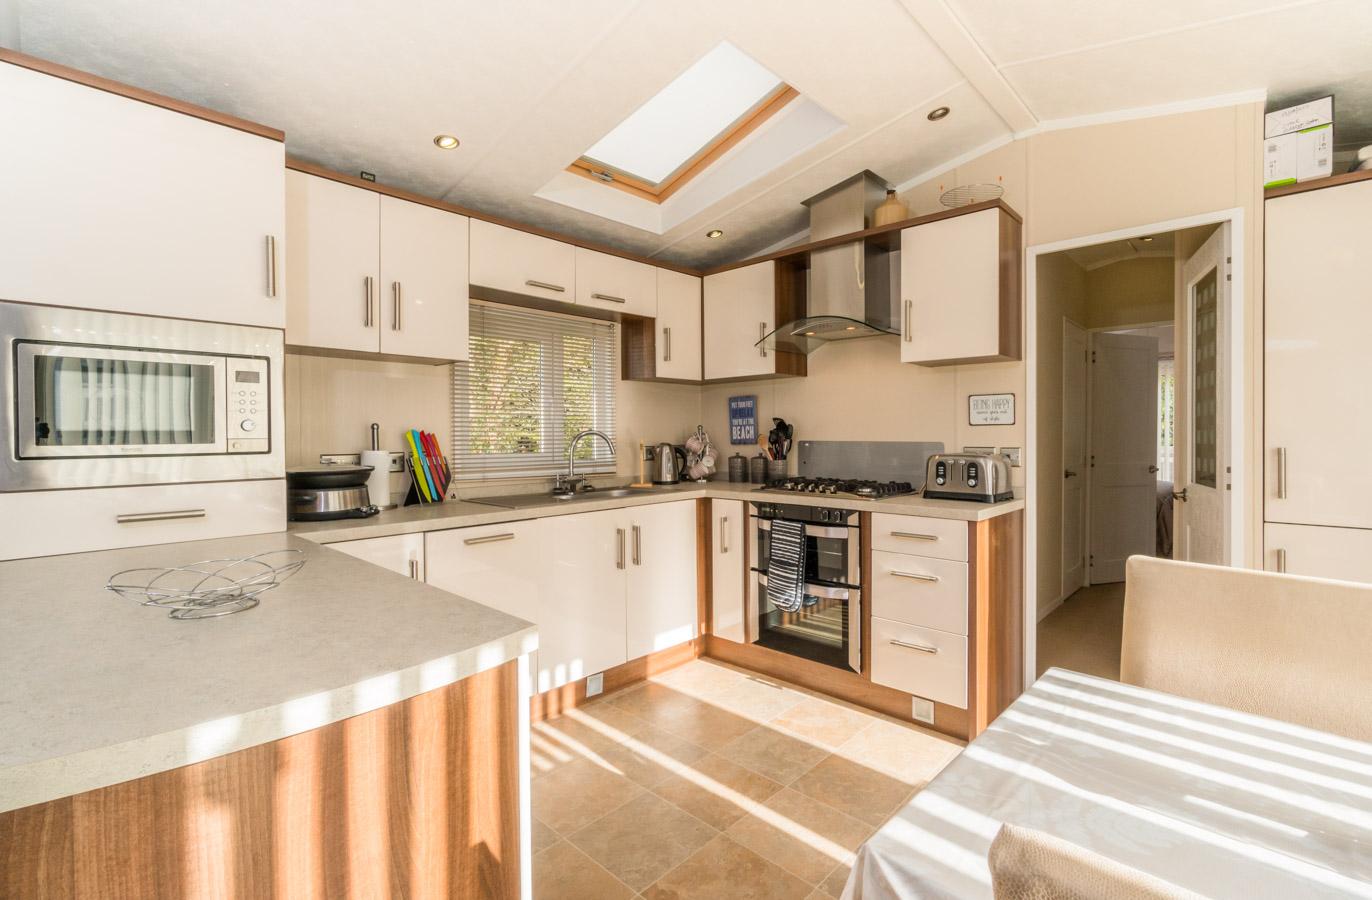 Neil-Bigwood-Monkton-Wyld-Holiday-Homes-45